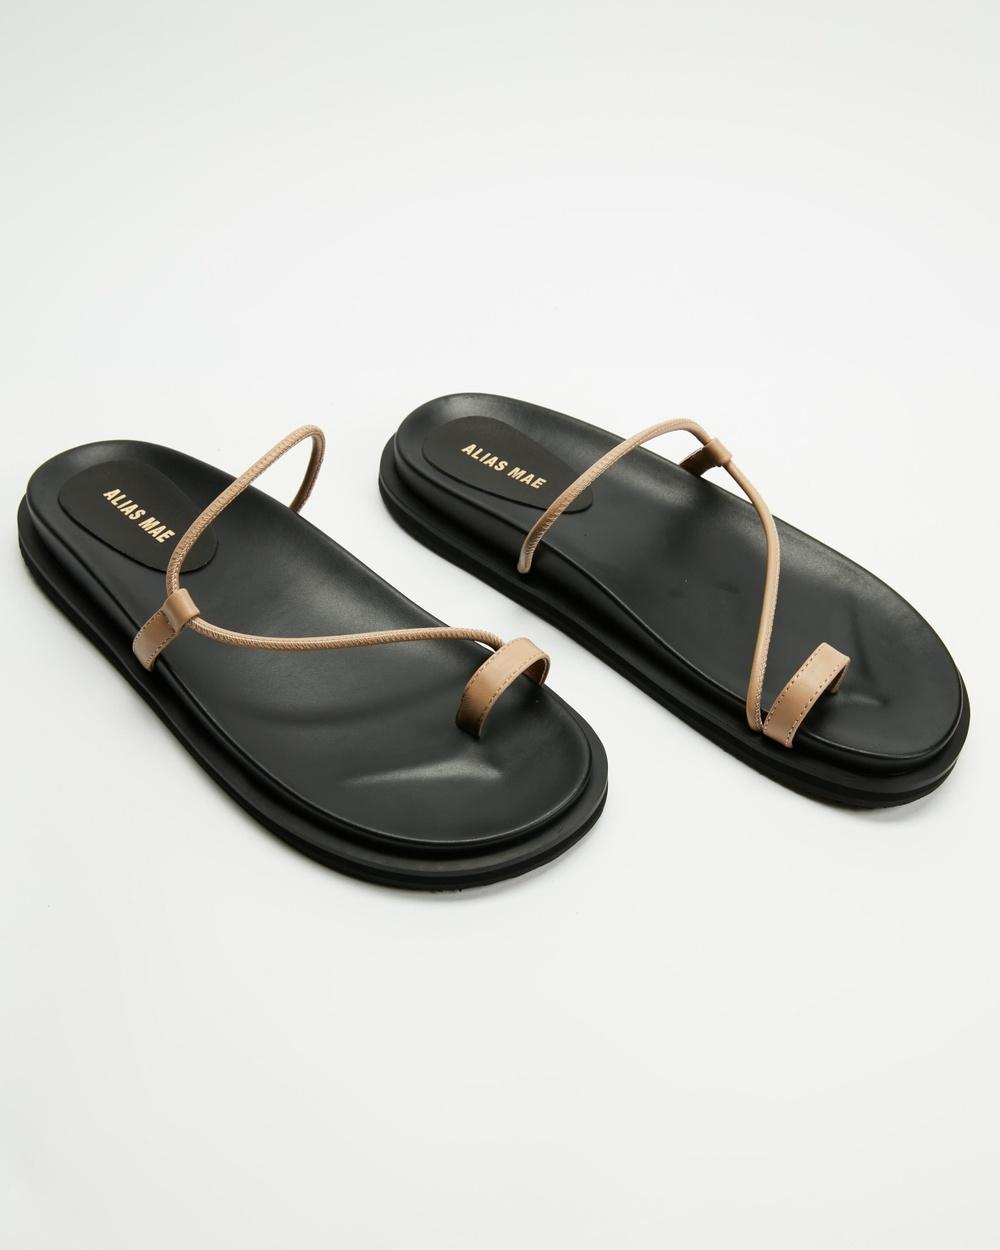 Alias Mae Soji Sandals Natural Leather